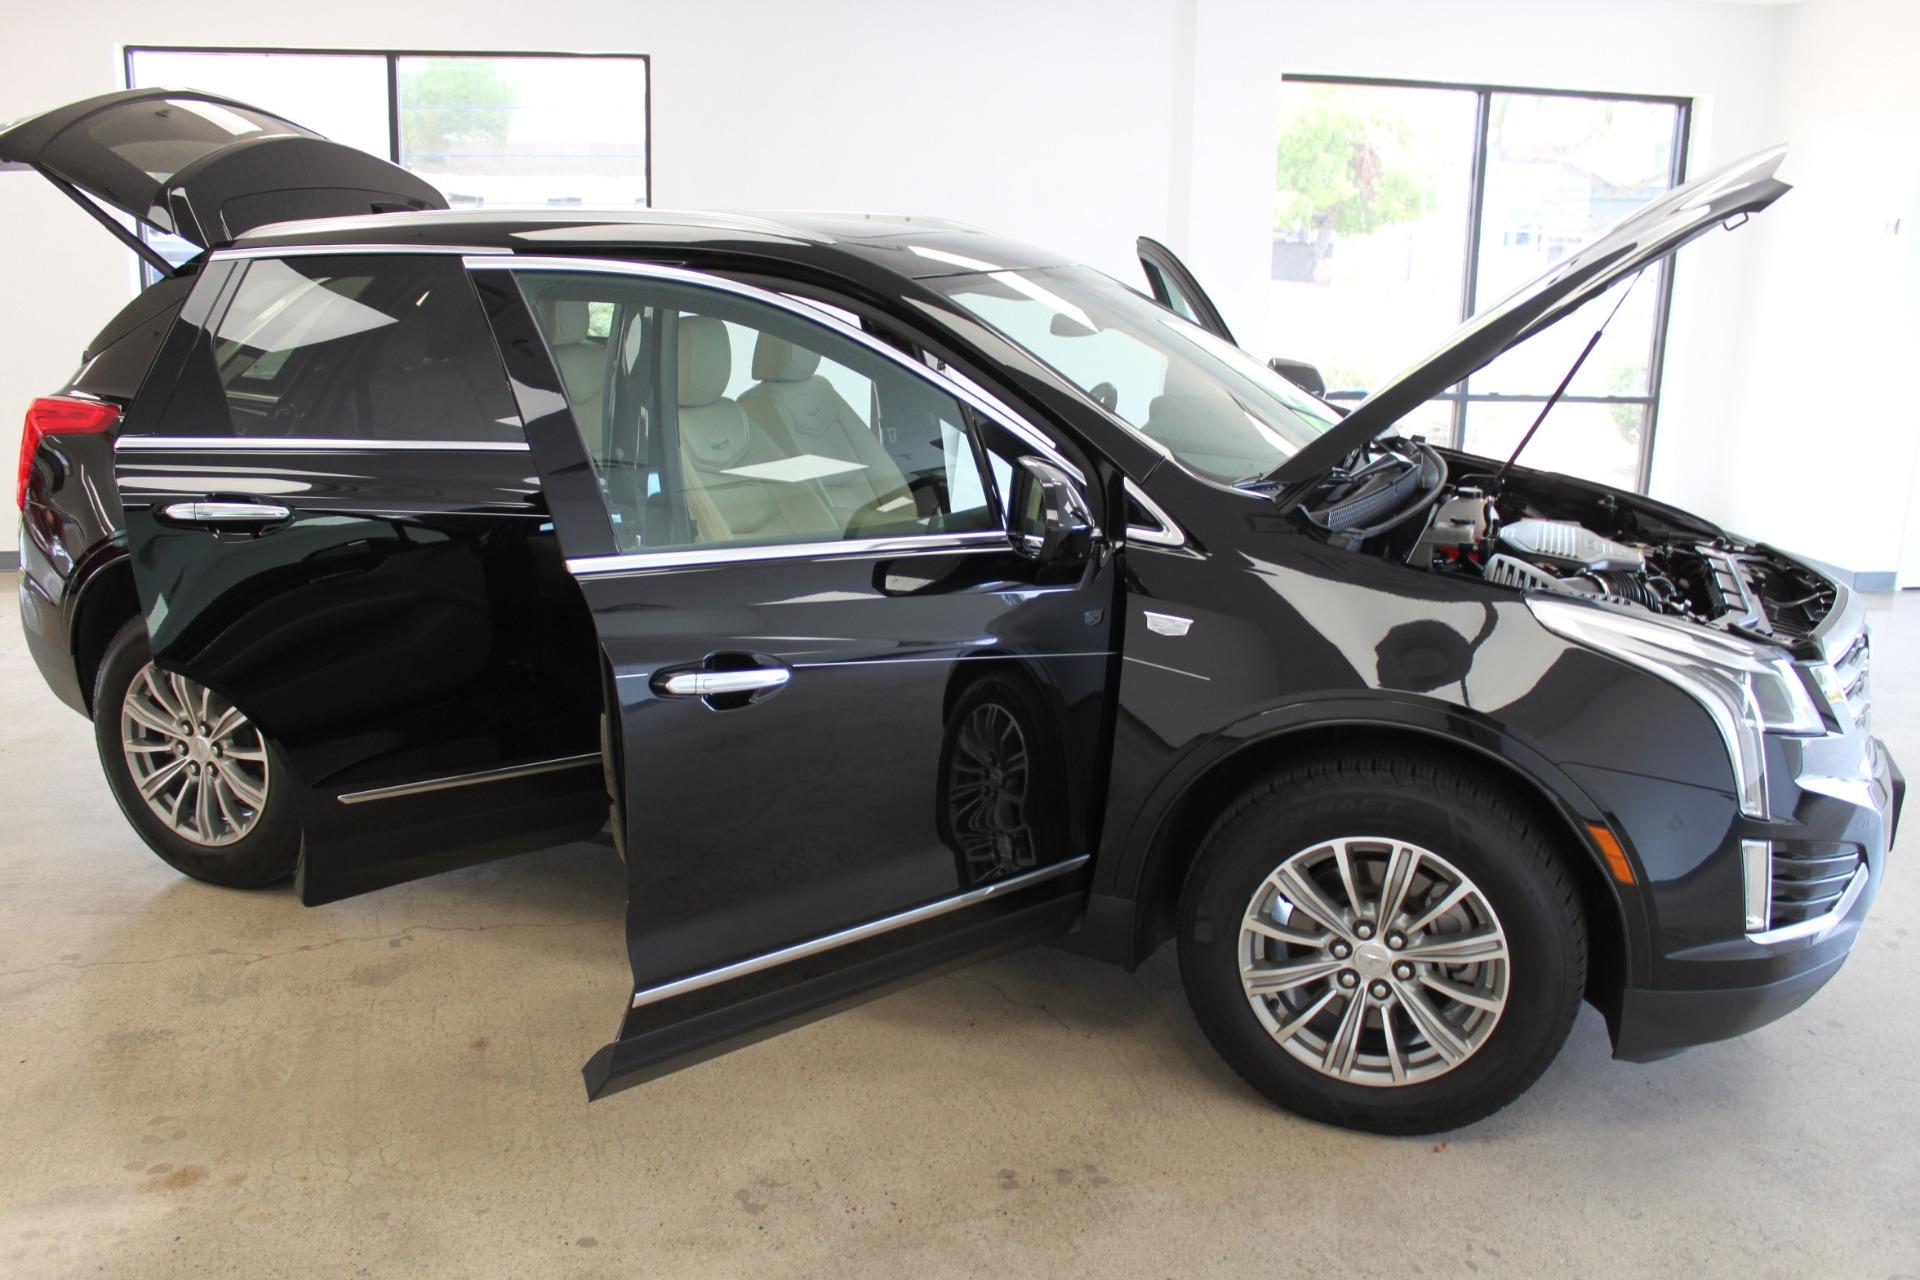 Used-2017-Cadillac-XT5-Luxury-All-Wheel-Drive-Luxury-AWD-Tesla